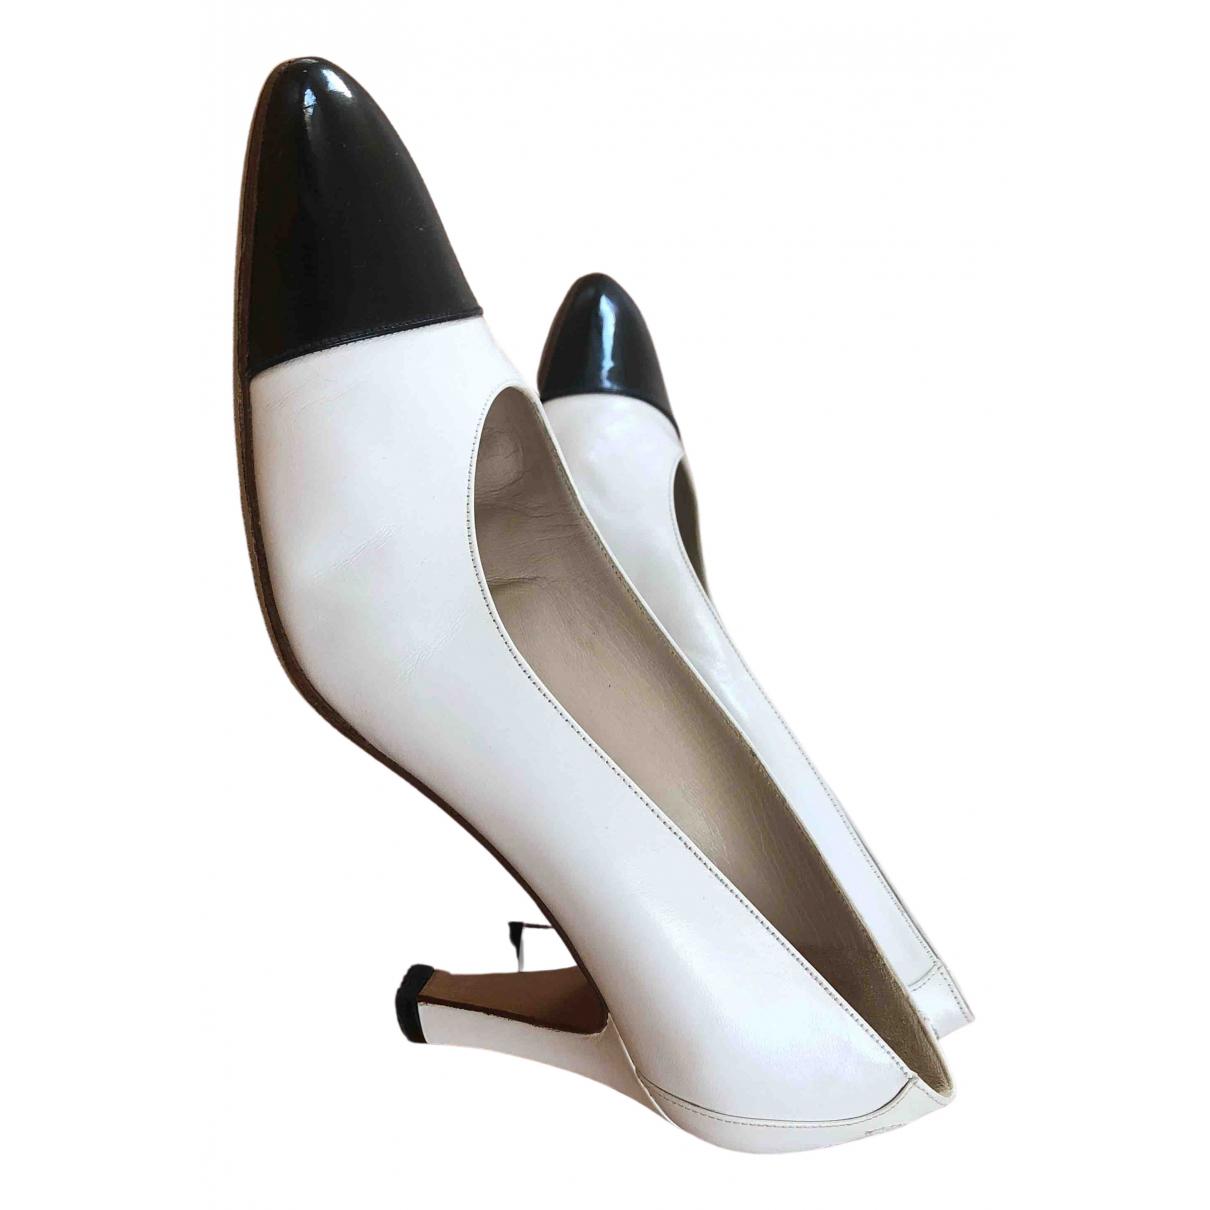 Chanel N White Leather Heels for Women 36.5 EU